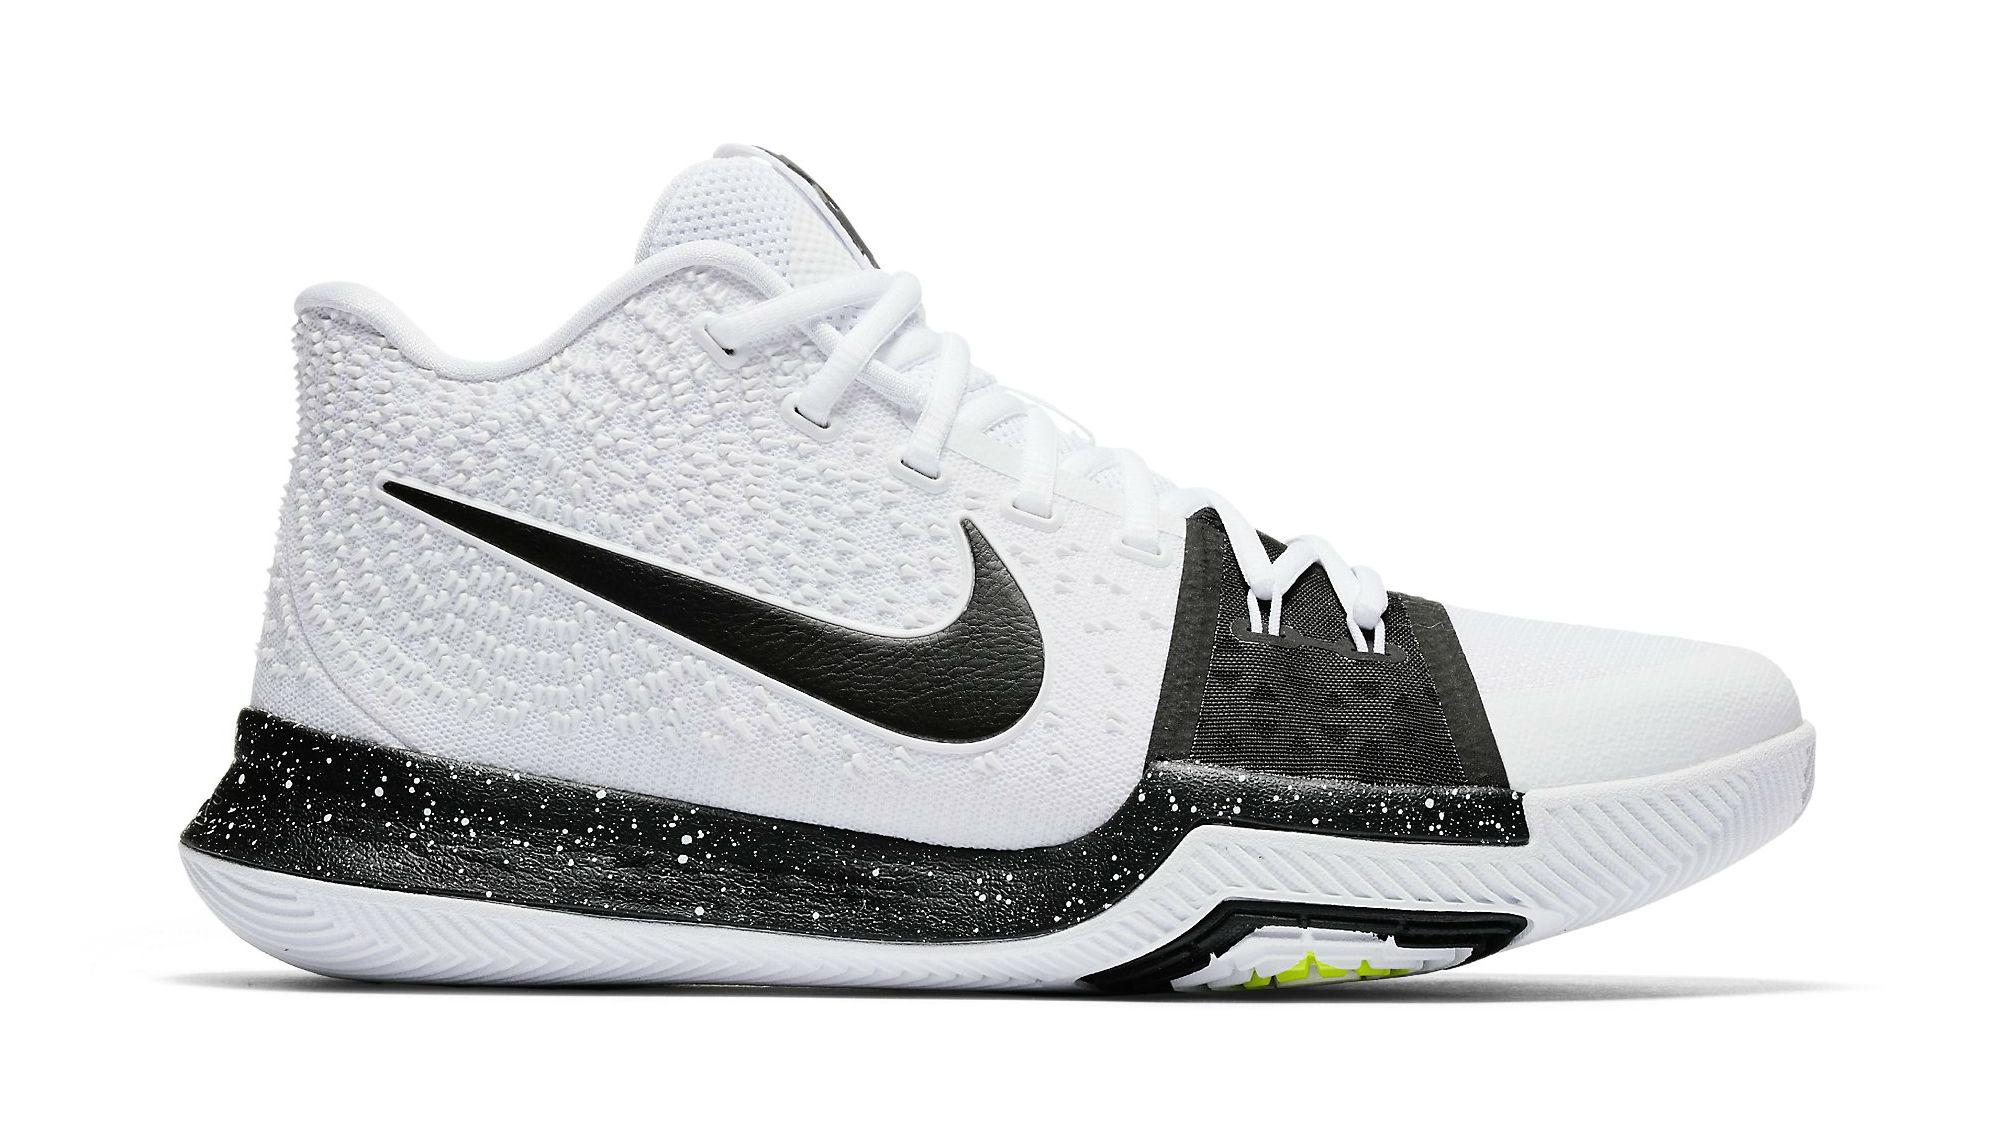 Nike Kyrie 3 White/Black-Volt